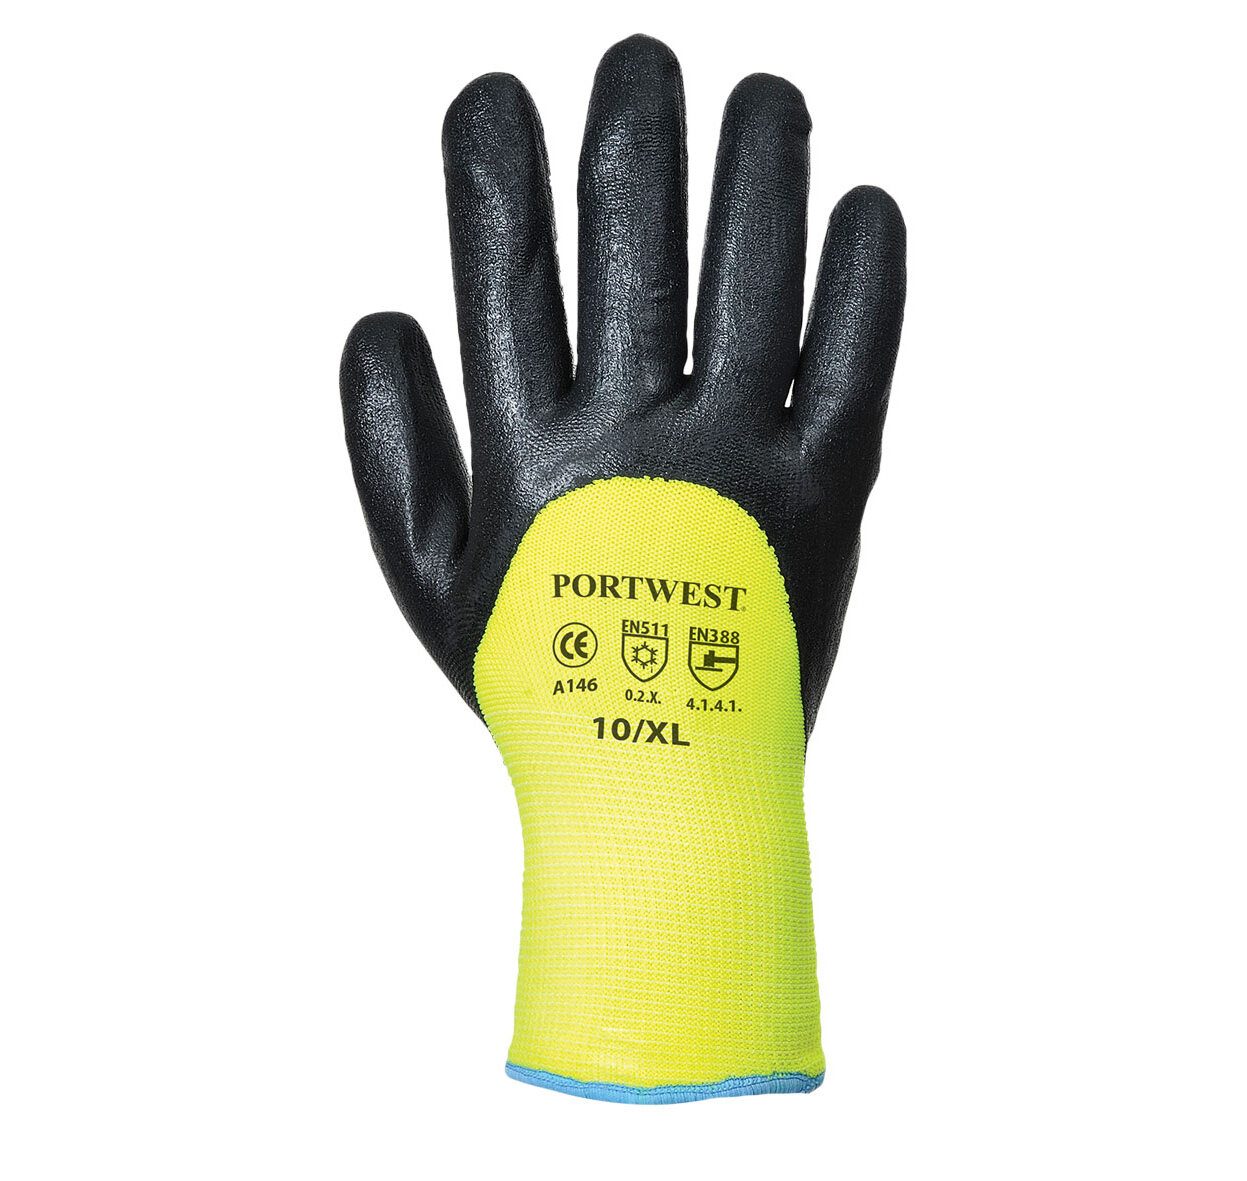 PORTWEST A146 Thermal Grip Glove (Pair)